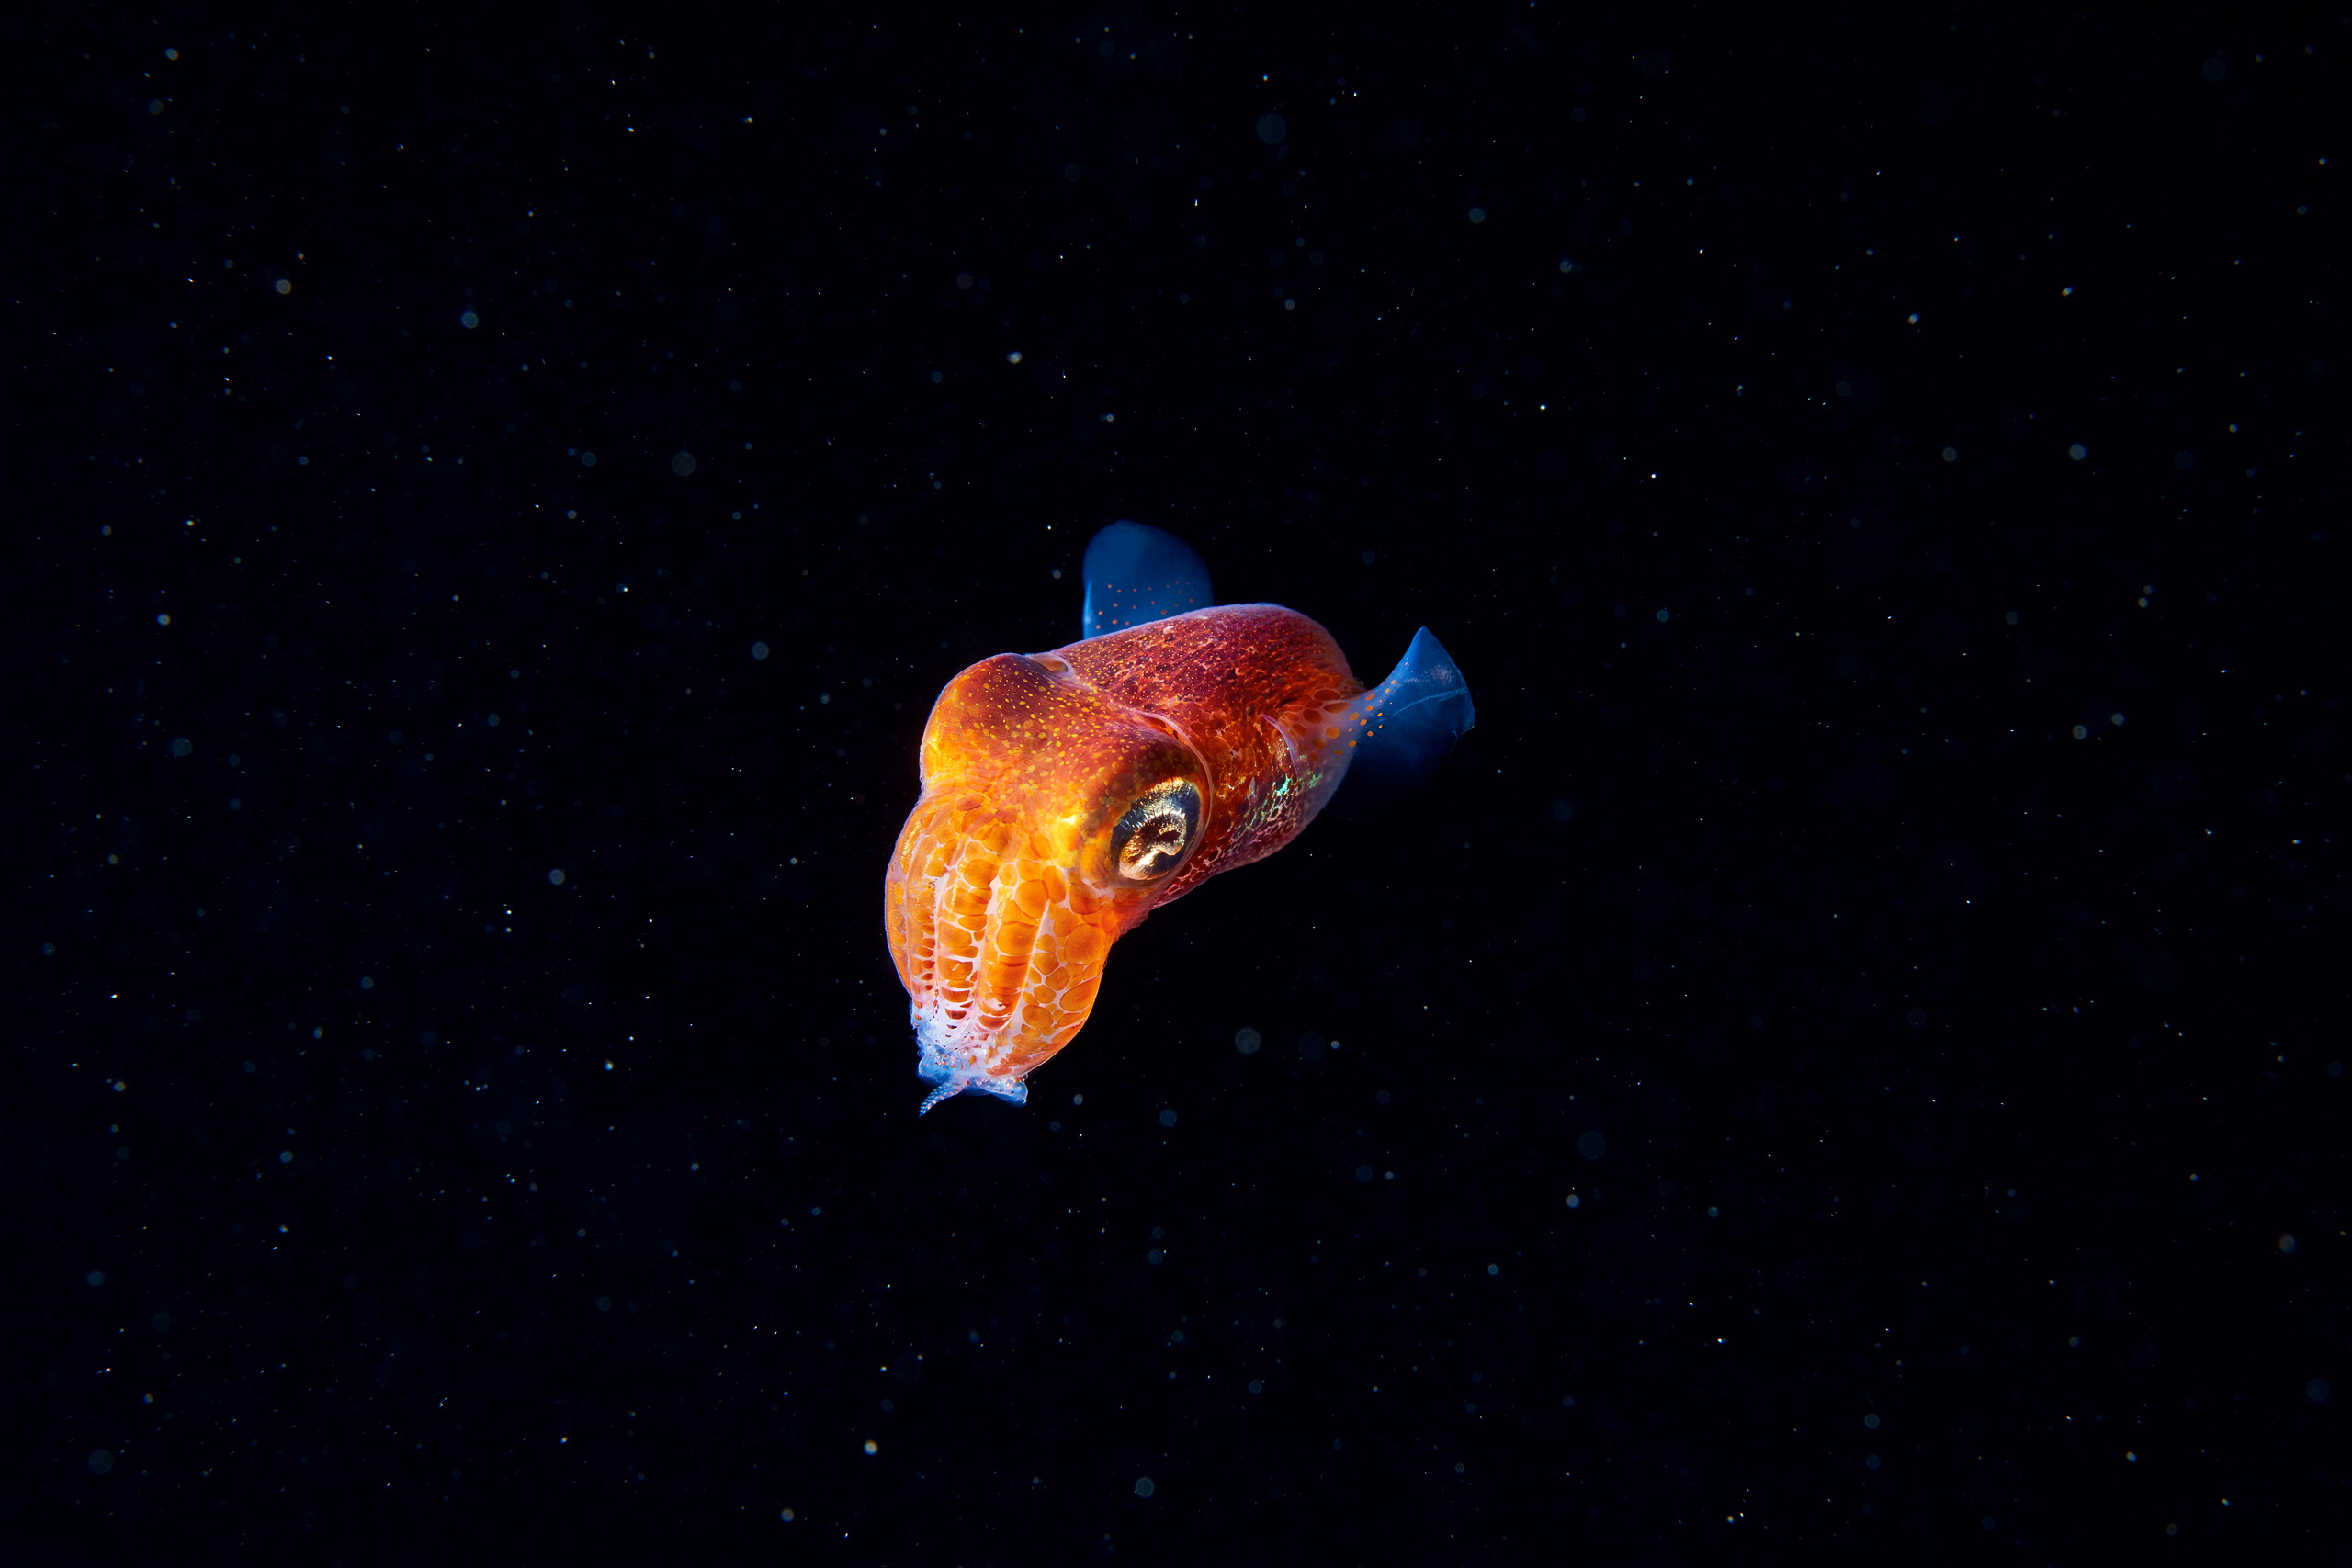 Cephalopoda – Sepiola sp